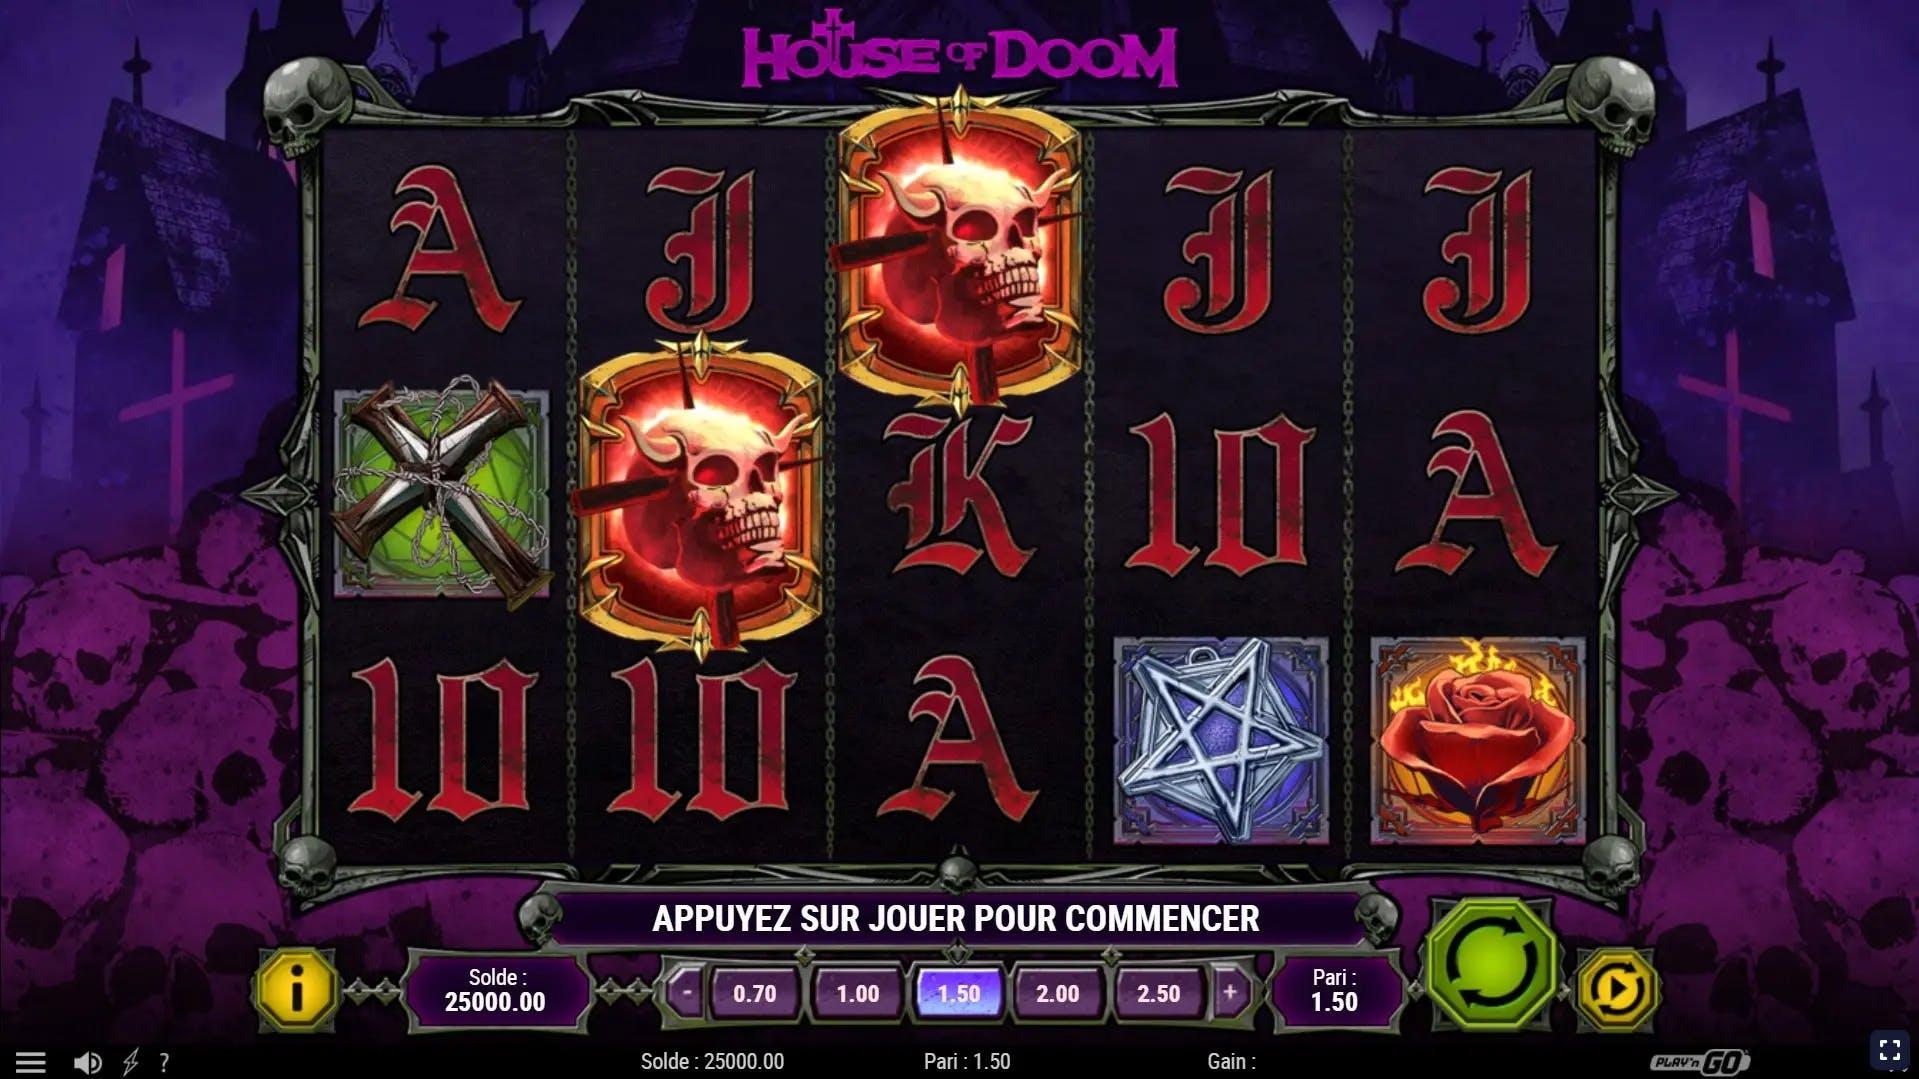 gameplay house of doom playngo